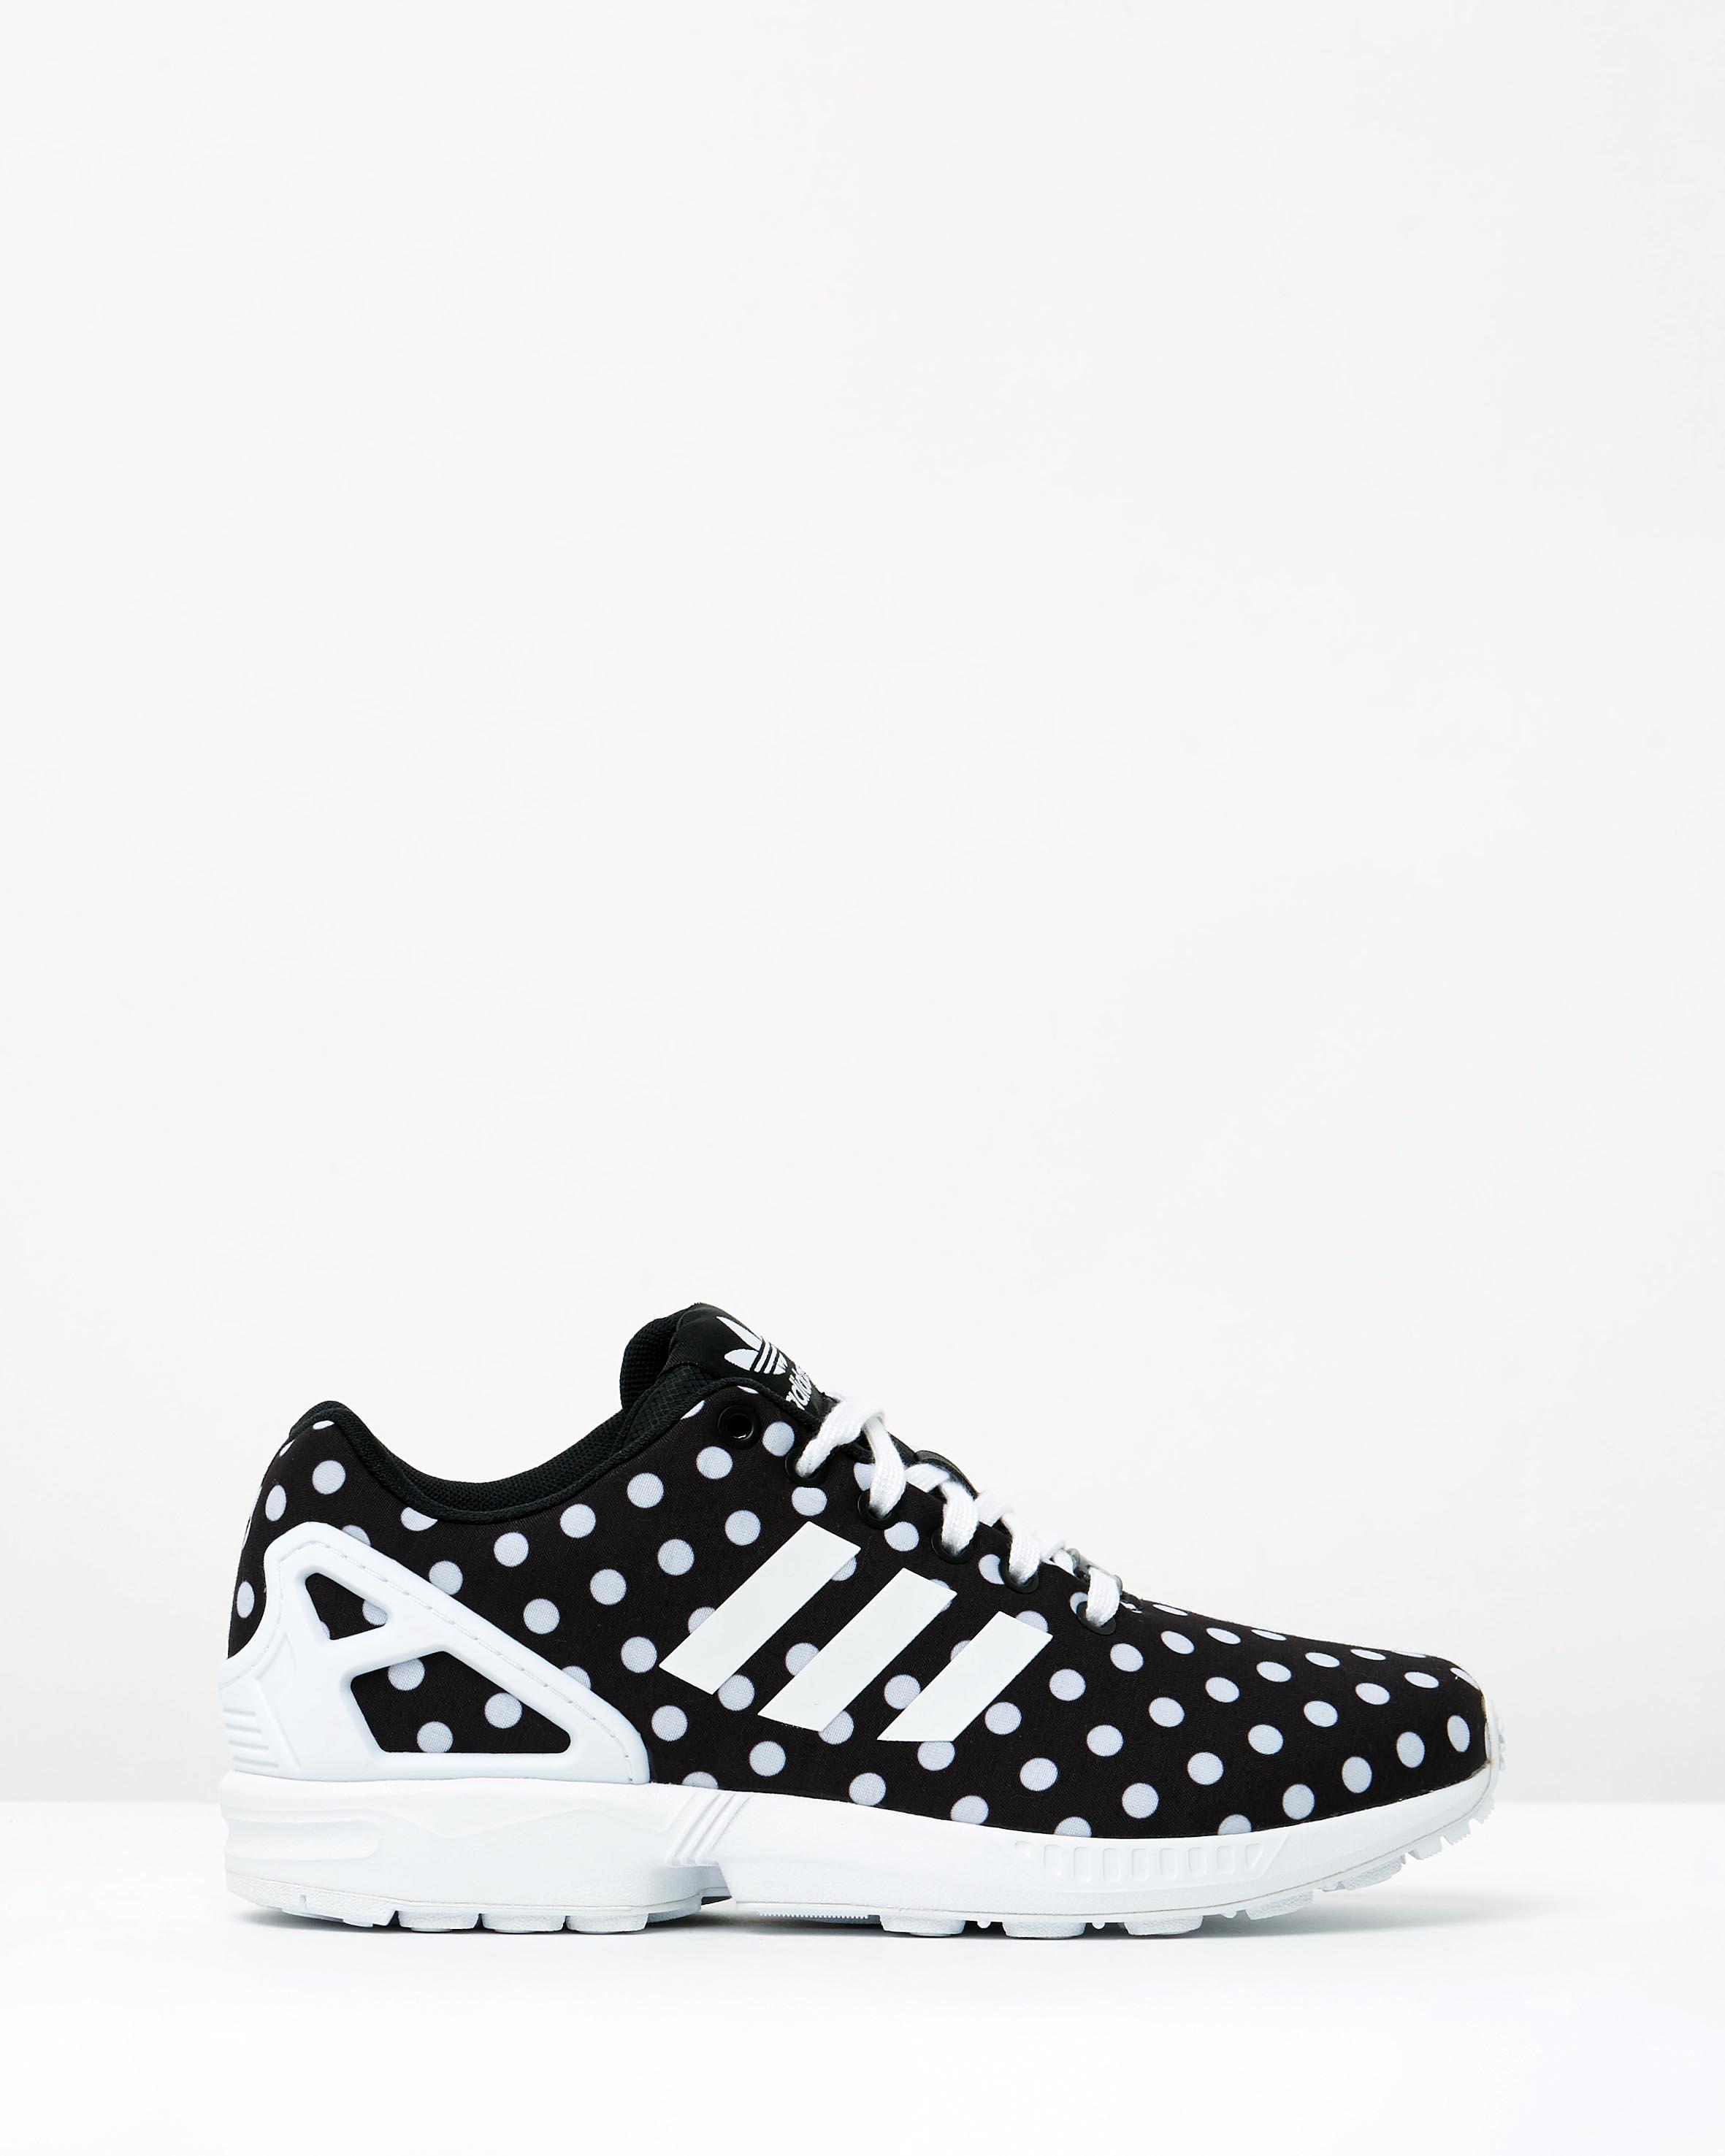 Sneakers | Women's Sneakers Online | Buy Sneakers Australia |- THE